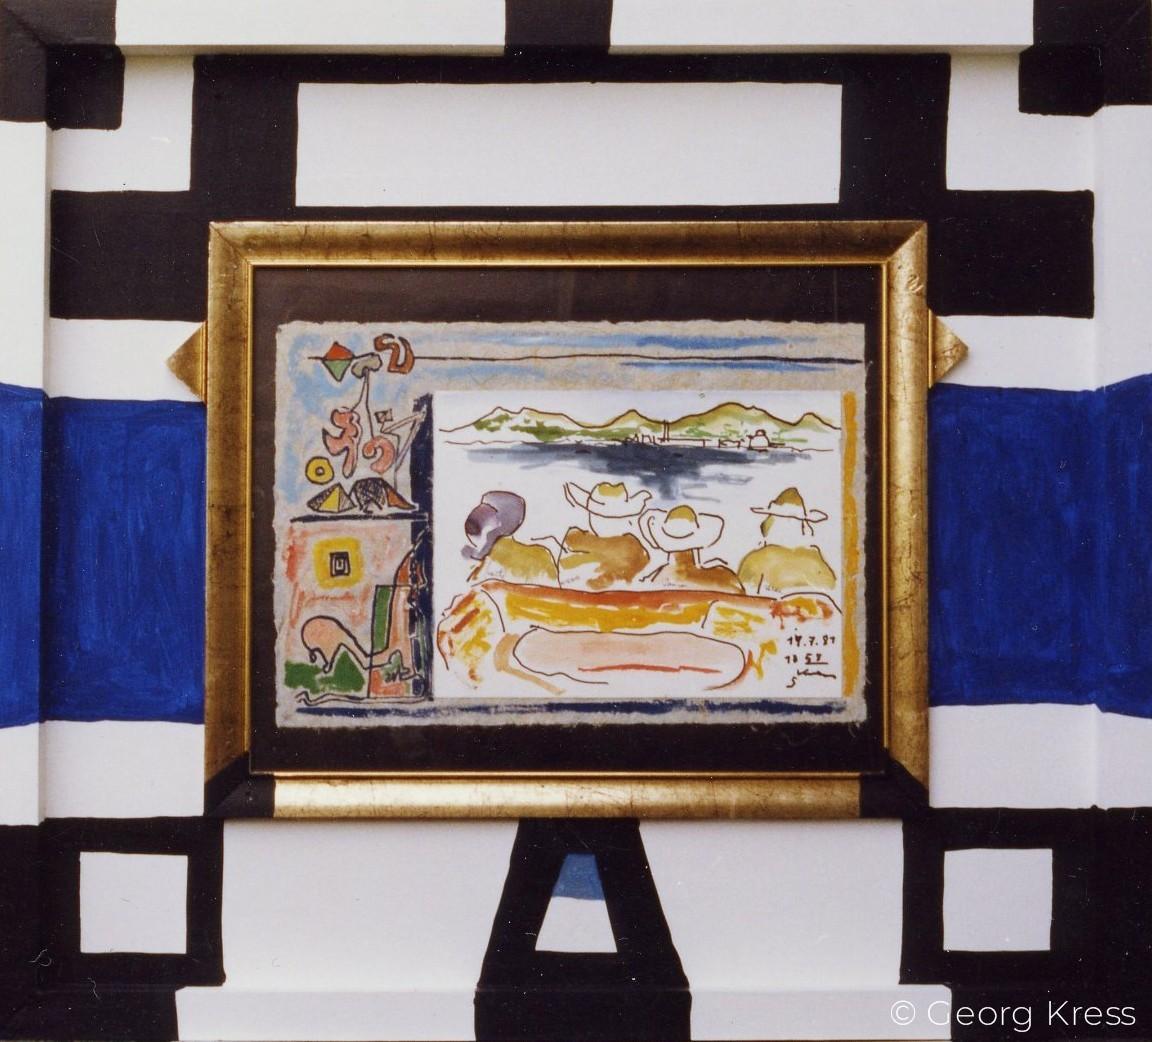 Kornati III. Freunde. 1981. Aquarell, Dispersion auf Japanpapier, Holz.